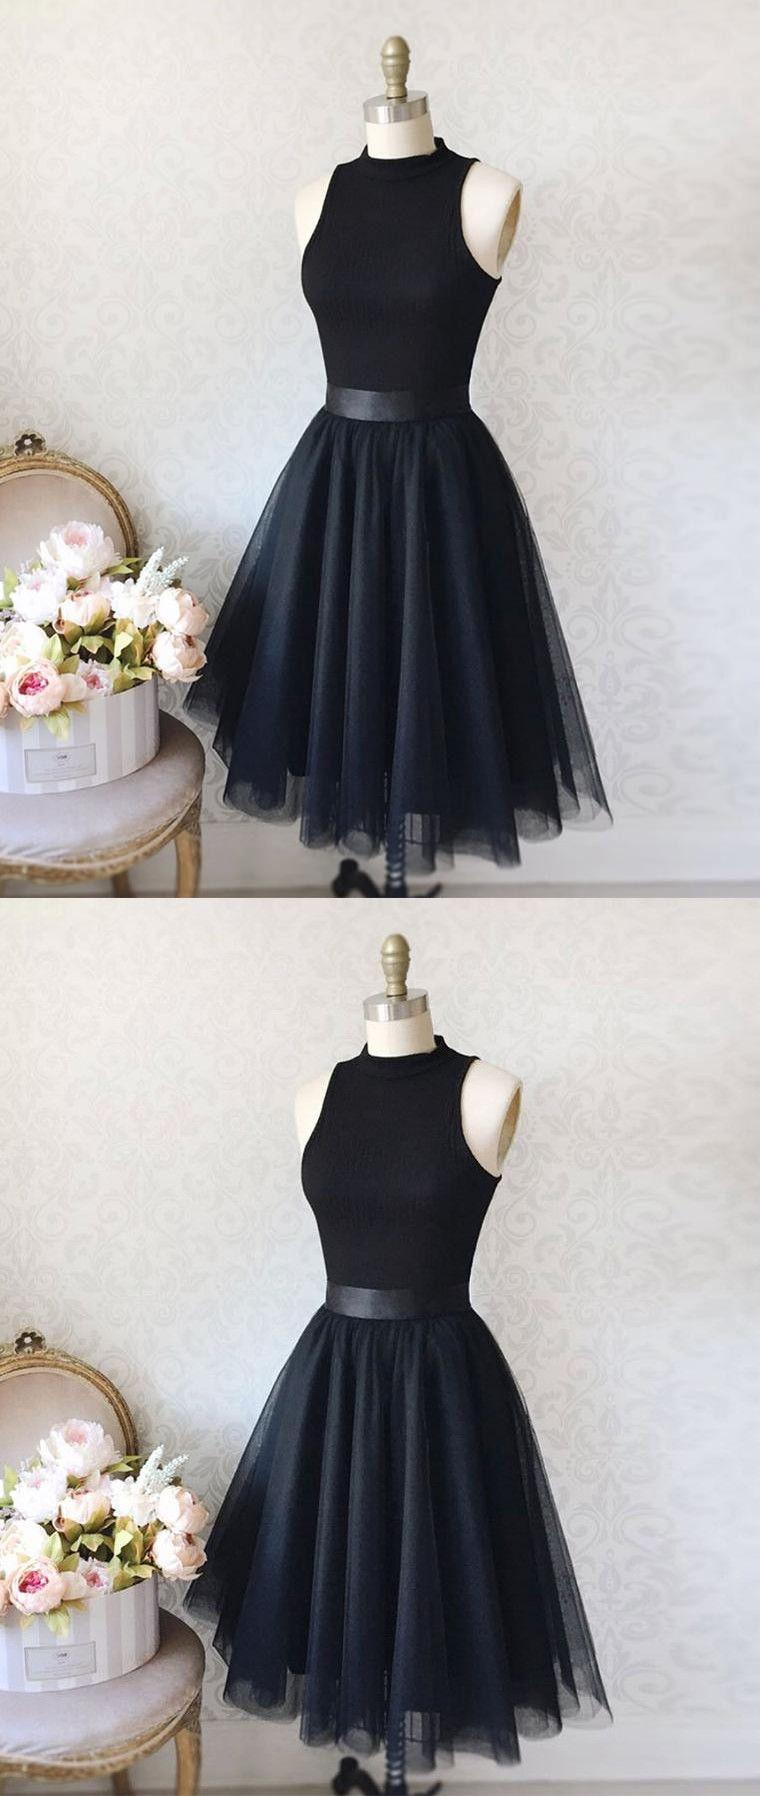 Vintage aline high neck sleeveless kneelength black homecoming